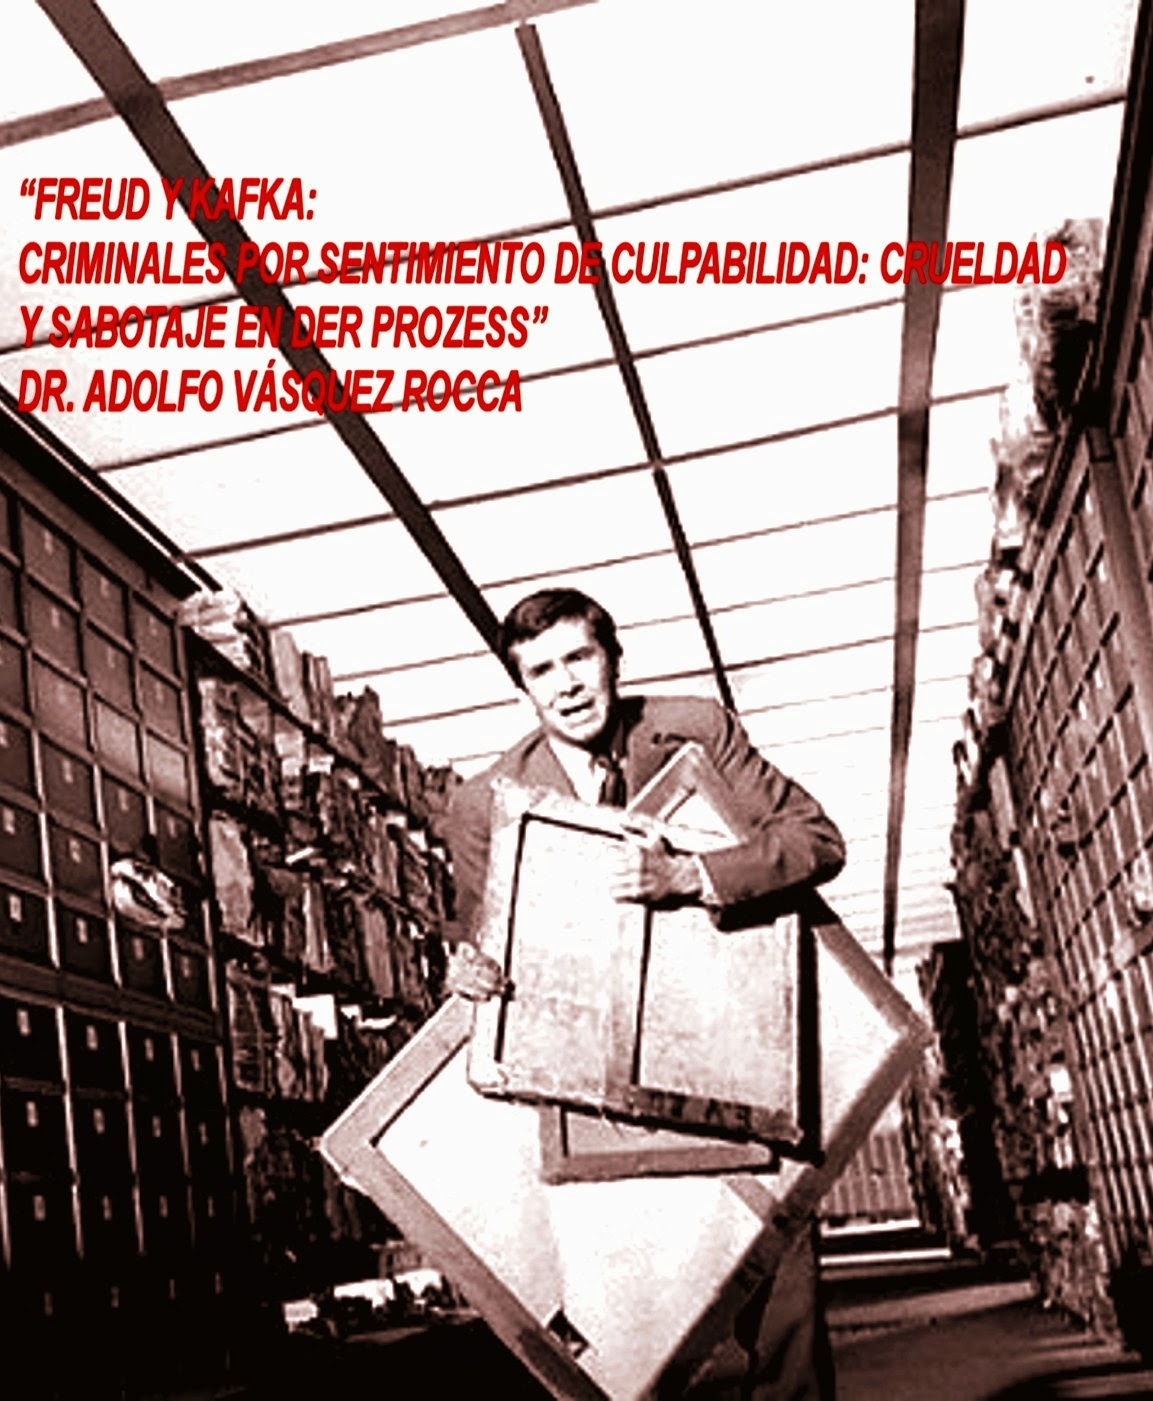 http://2.bp.blogspot.com/-XworS8lR1Vk/UrN3egAPtnI/AAAAAAAAMfs/vEt2wggN5Yk/s1600/Kafka+y+Freud+_+El+Proceso+1_+Articulo+_+Adolfo+Vasquez+Rocca+.jpeg